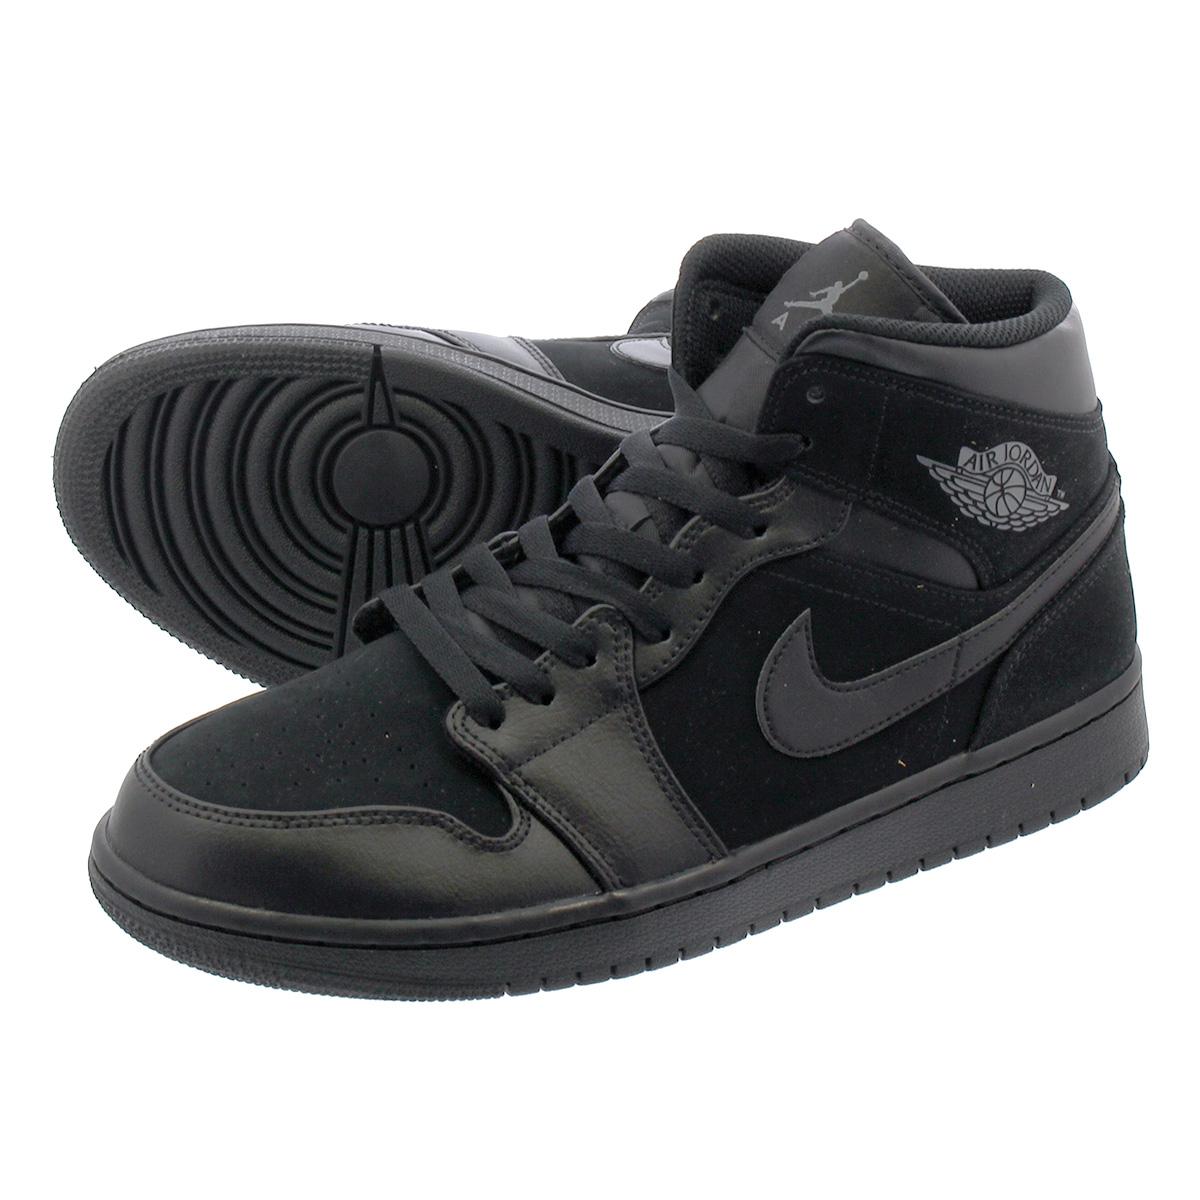 hot sale online 05f56 e3ddf NIKE AIR JORDAN 1 MID Nike Air Jordan 1 mid BLACK DARK GREY BLACK ...